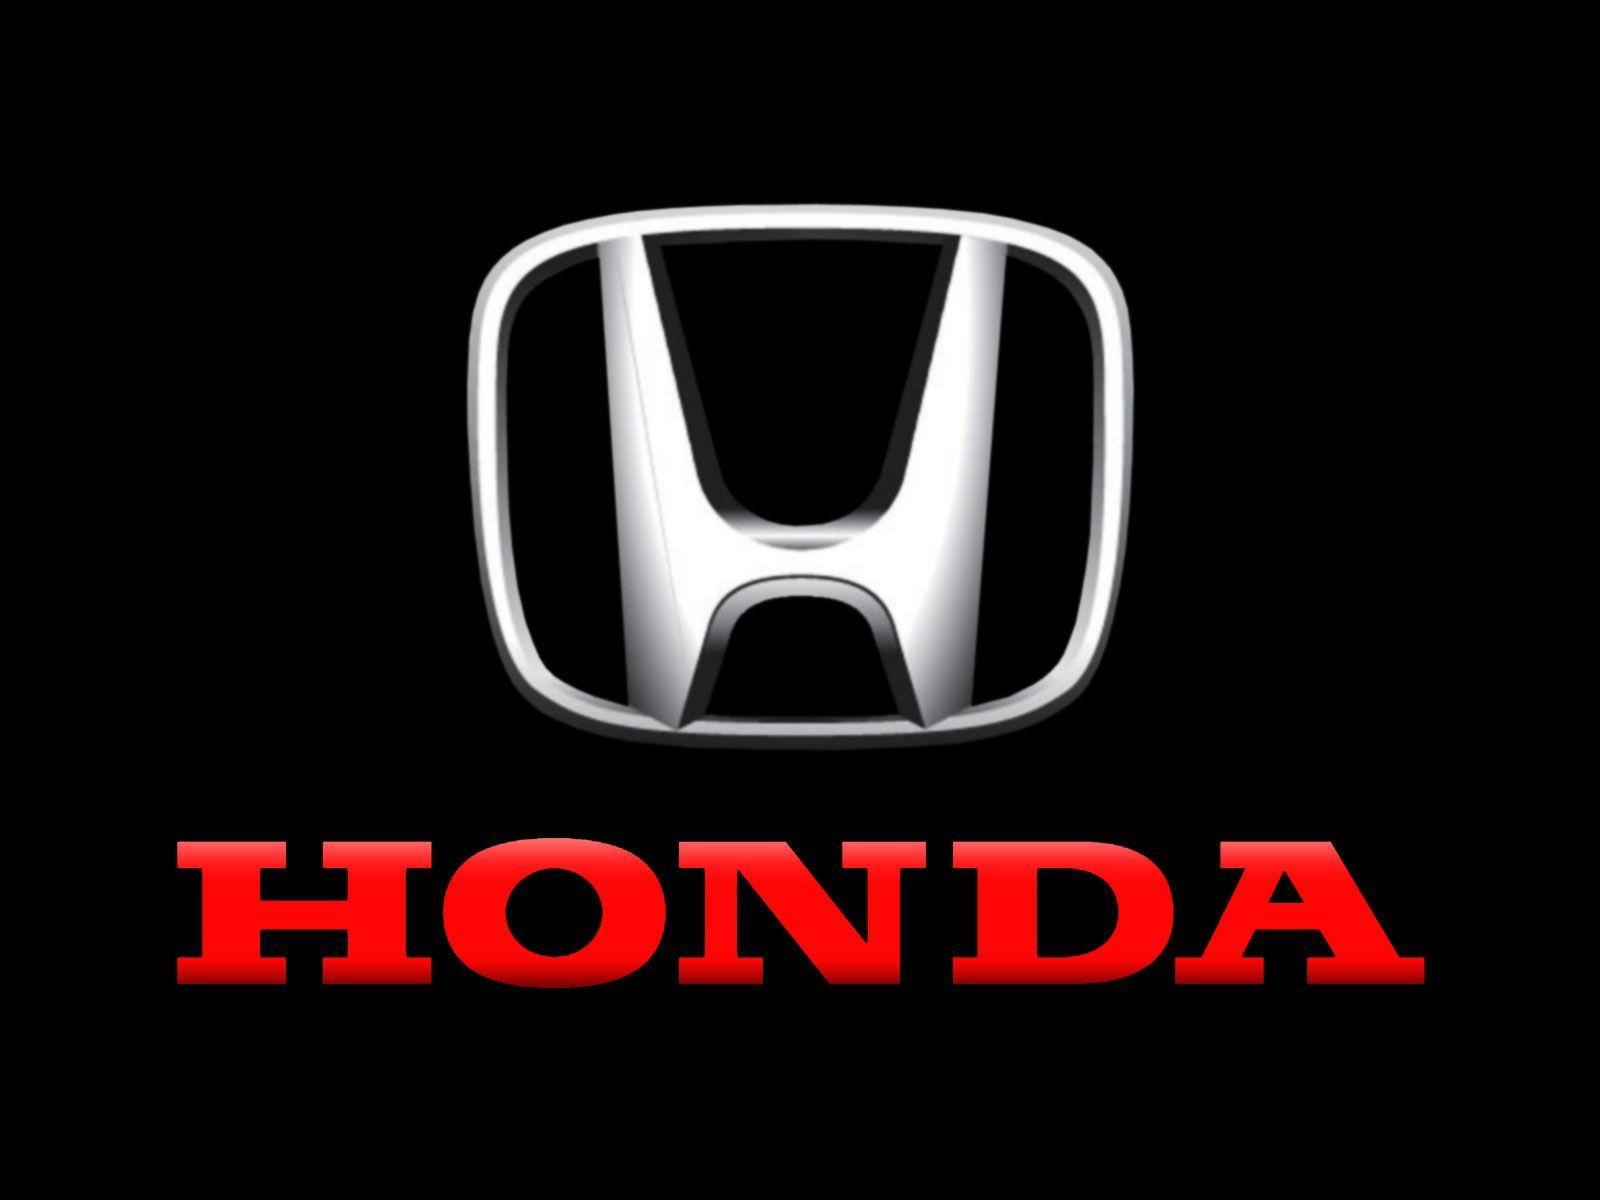 honda logo black background wallpaper | honda logo, honda, honda cars